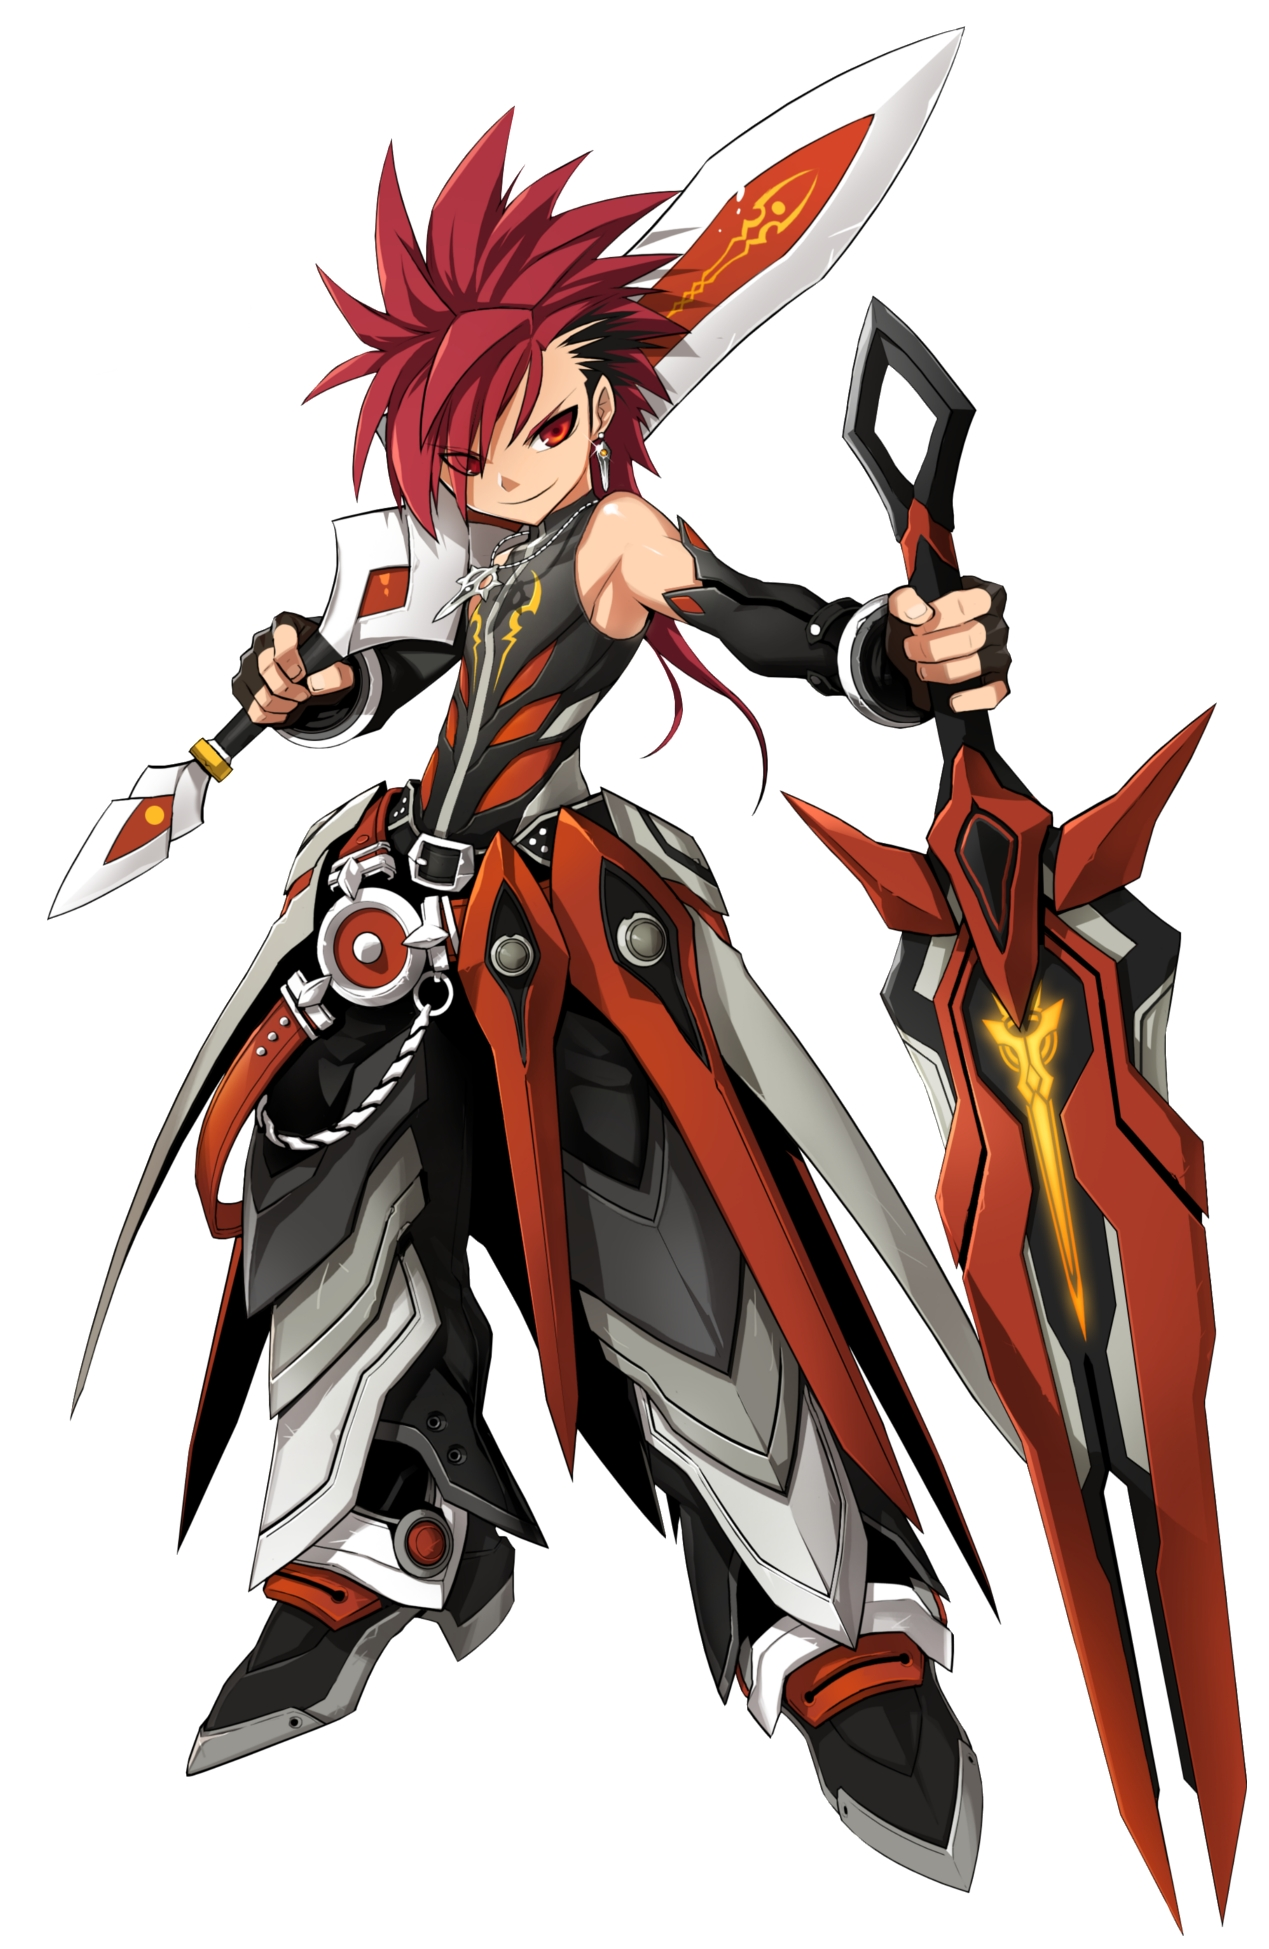 Anime Characters Using Sword : Infinity sword elsword character mobile